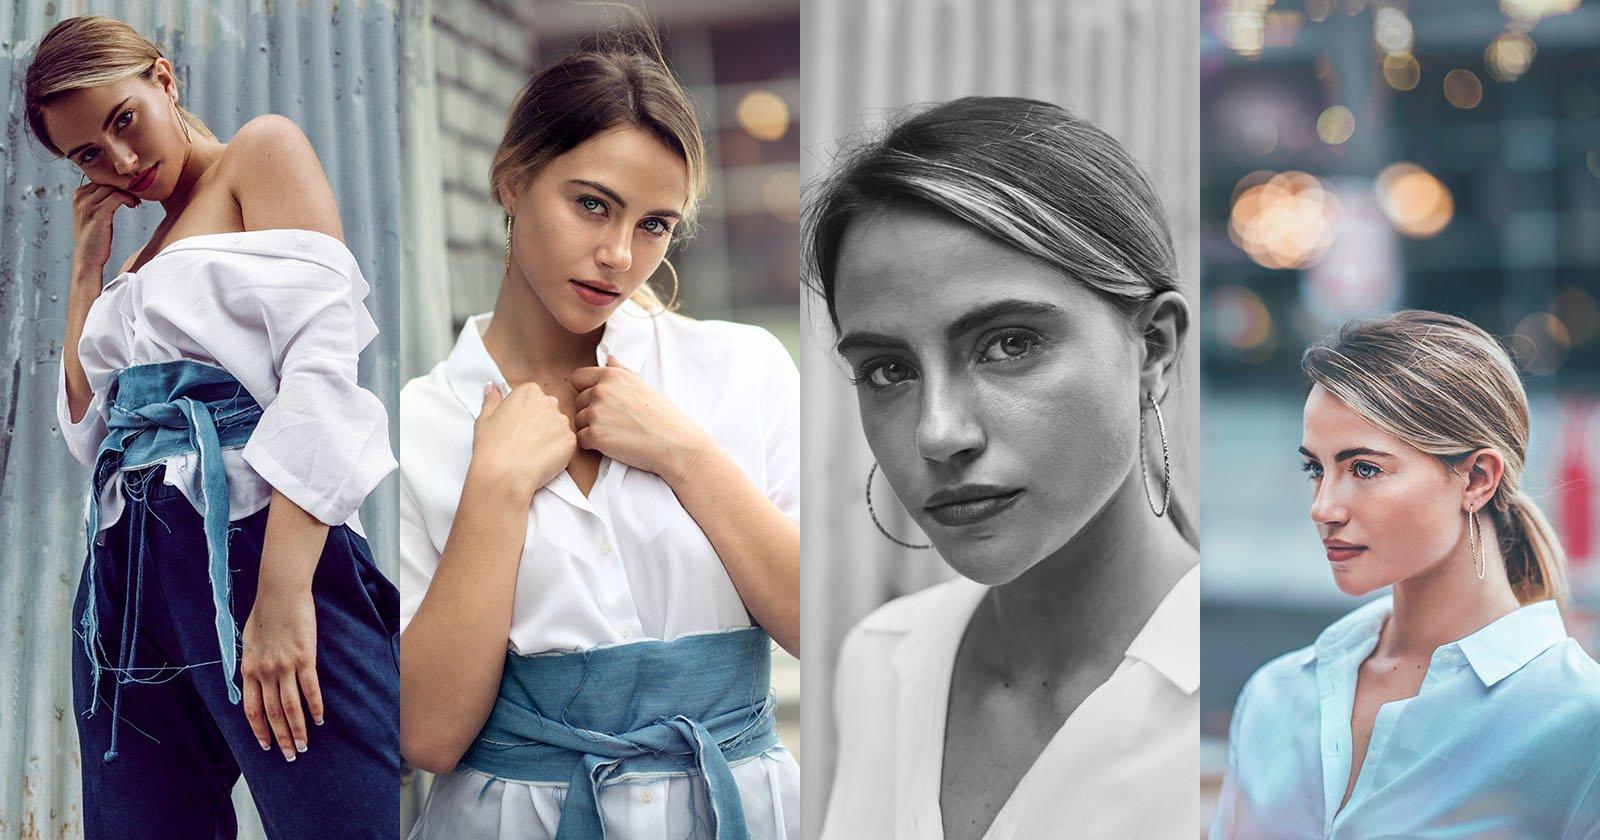 4 Top NYC Photographers Shoot the Same Model